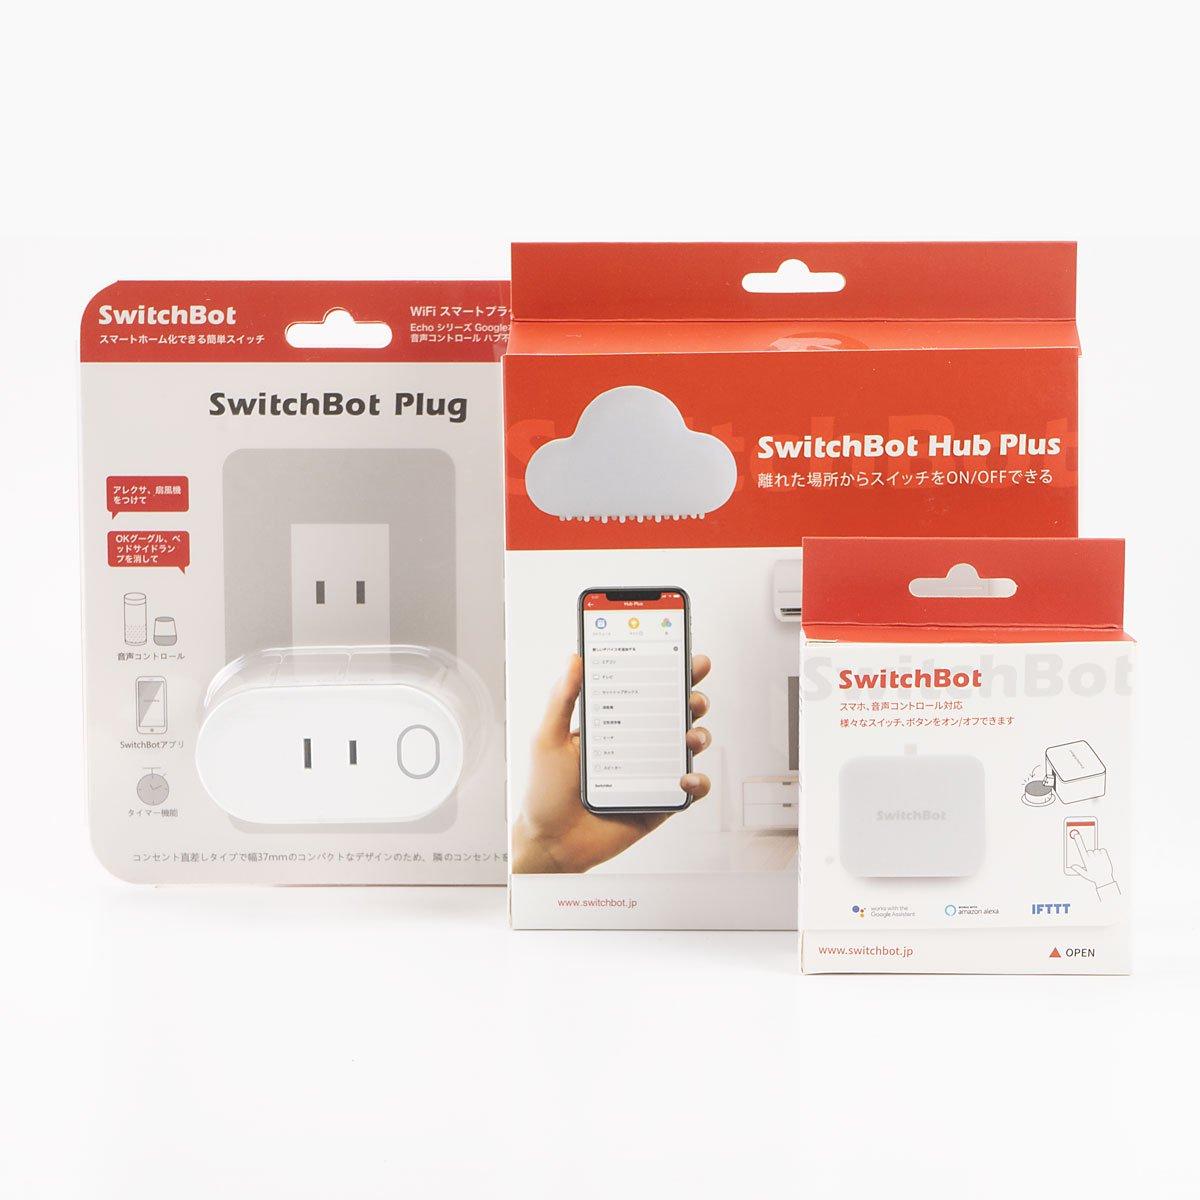 Switch Bot  & HUB Plus & Plug/ スイッチボット&ハブ プラス & プラグ セット